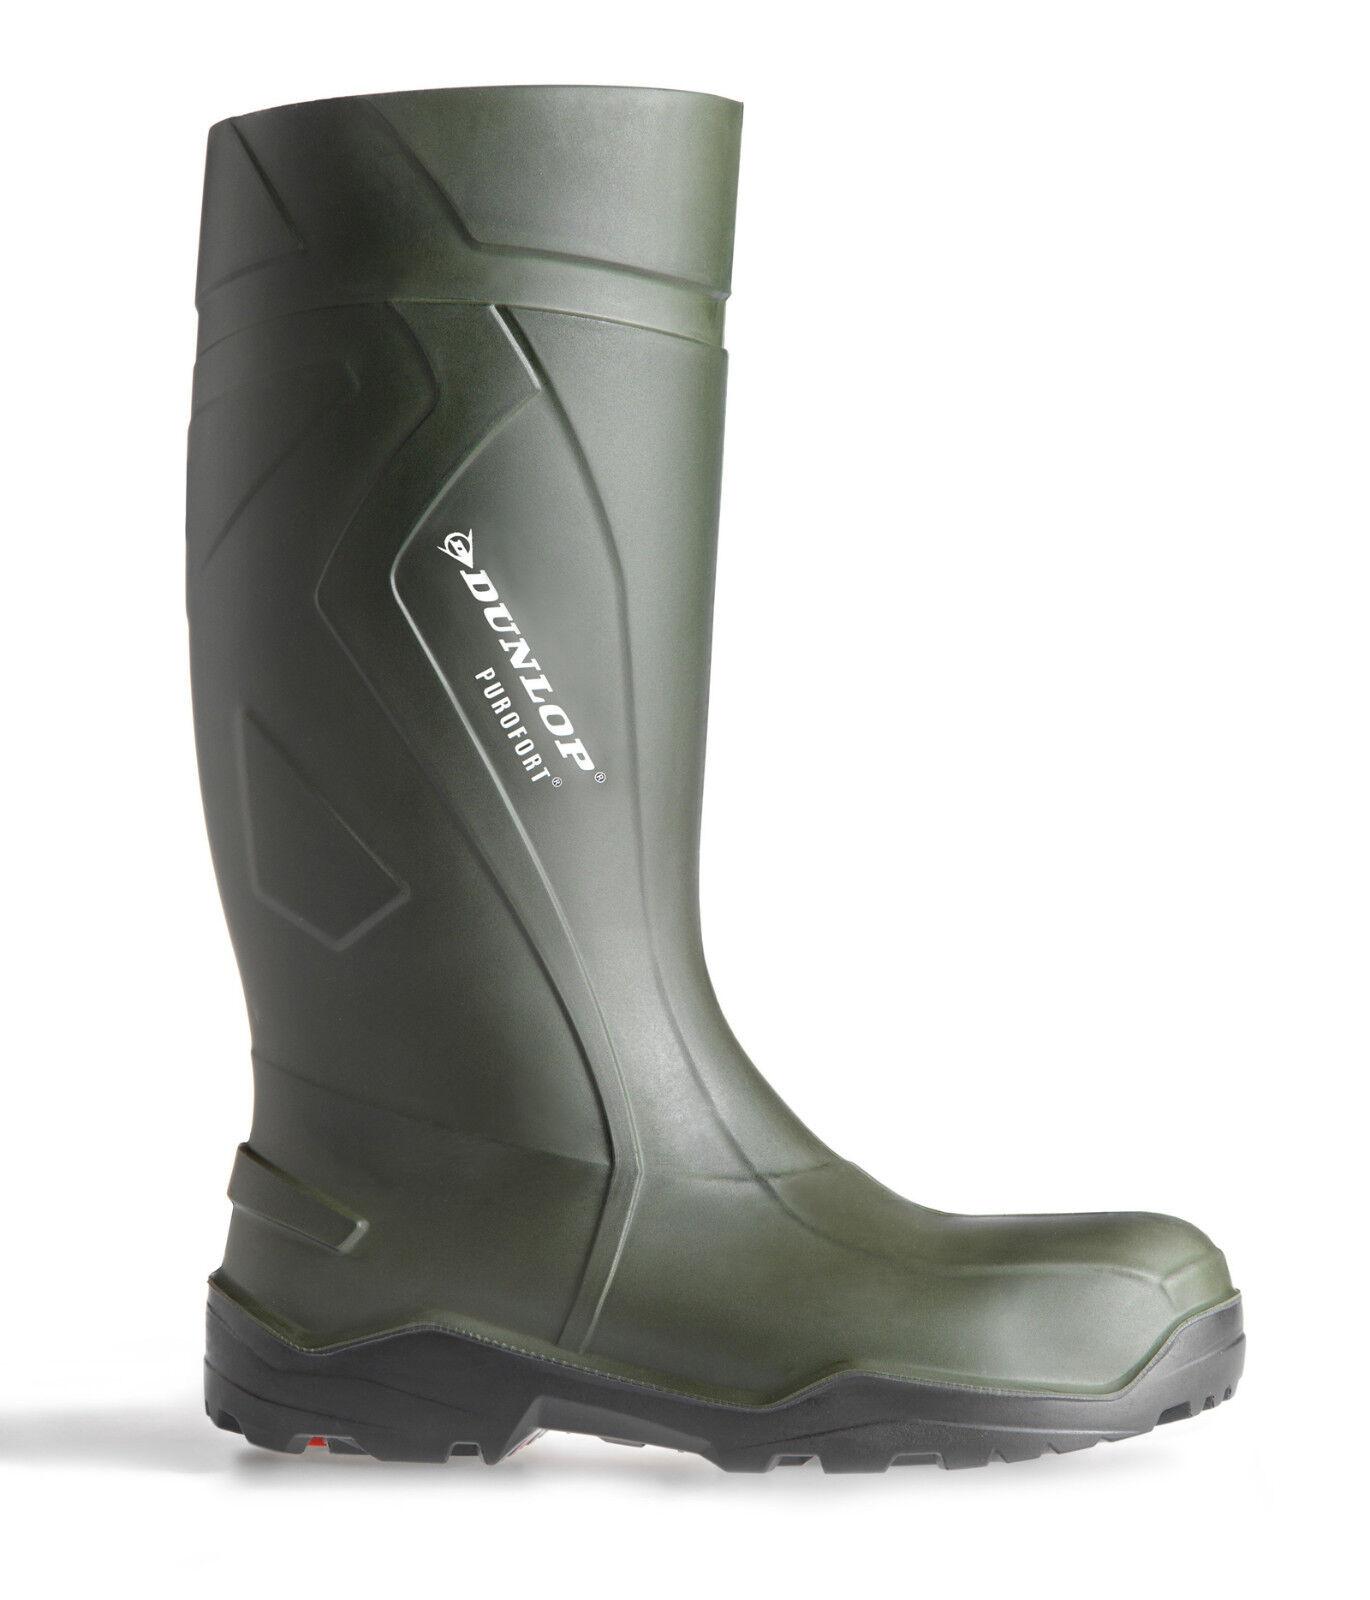 Dunlop Purofort Full Safety Thermo -20c Grün Mens Mens Mens Work Wellington Stiefel UK3-14 5e9f82